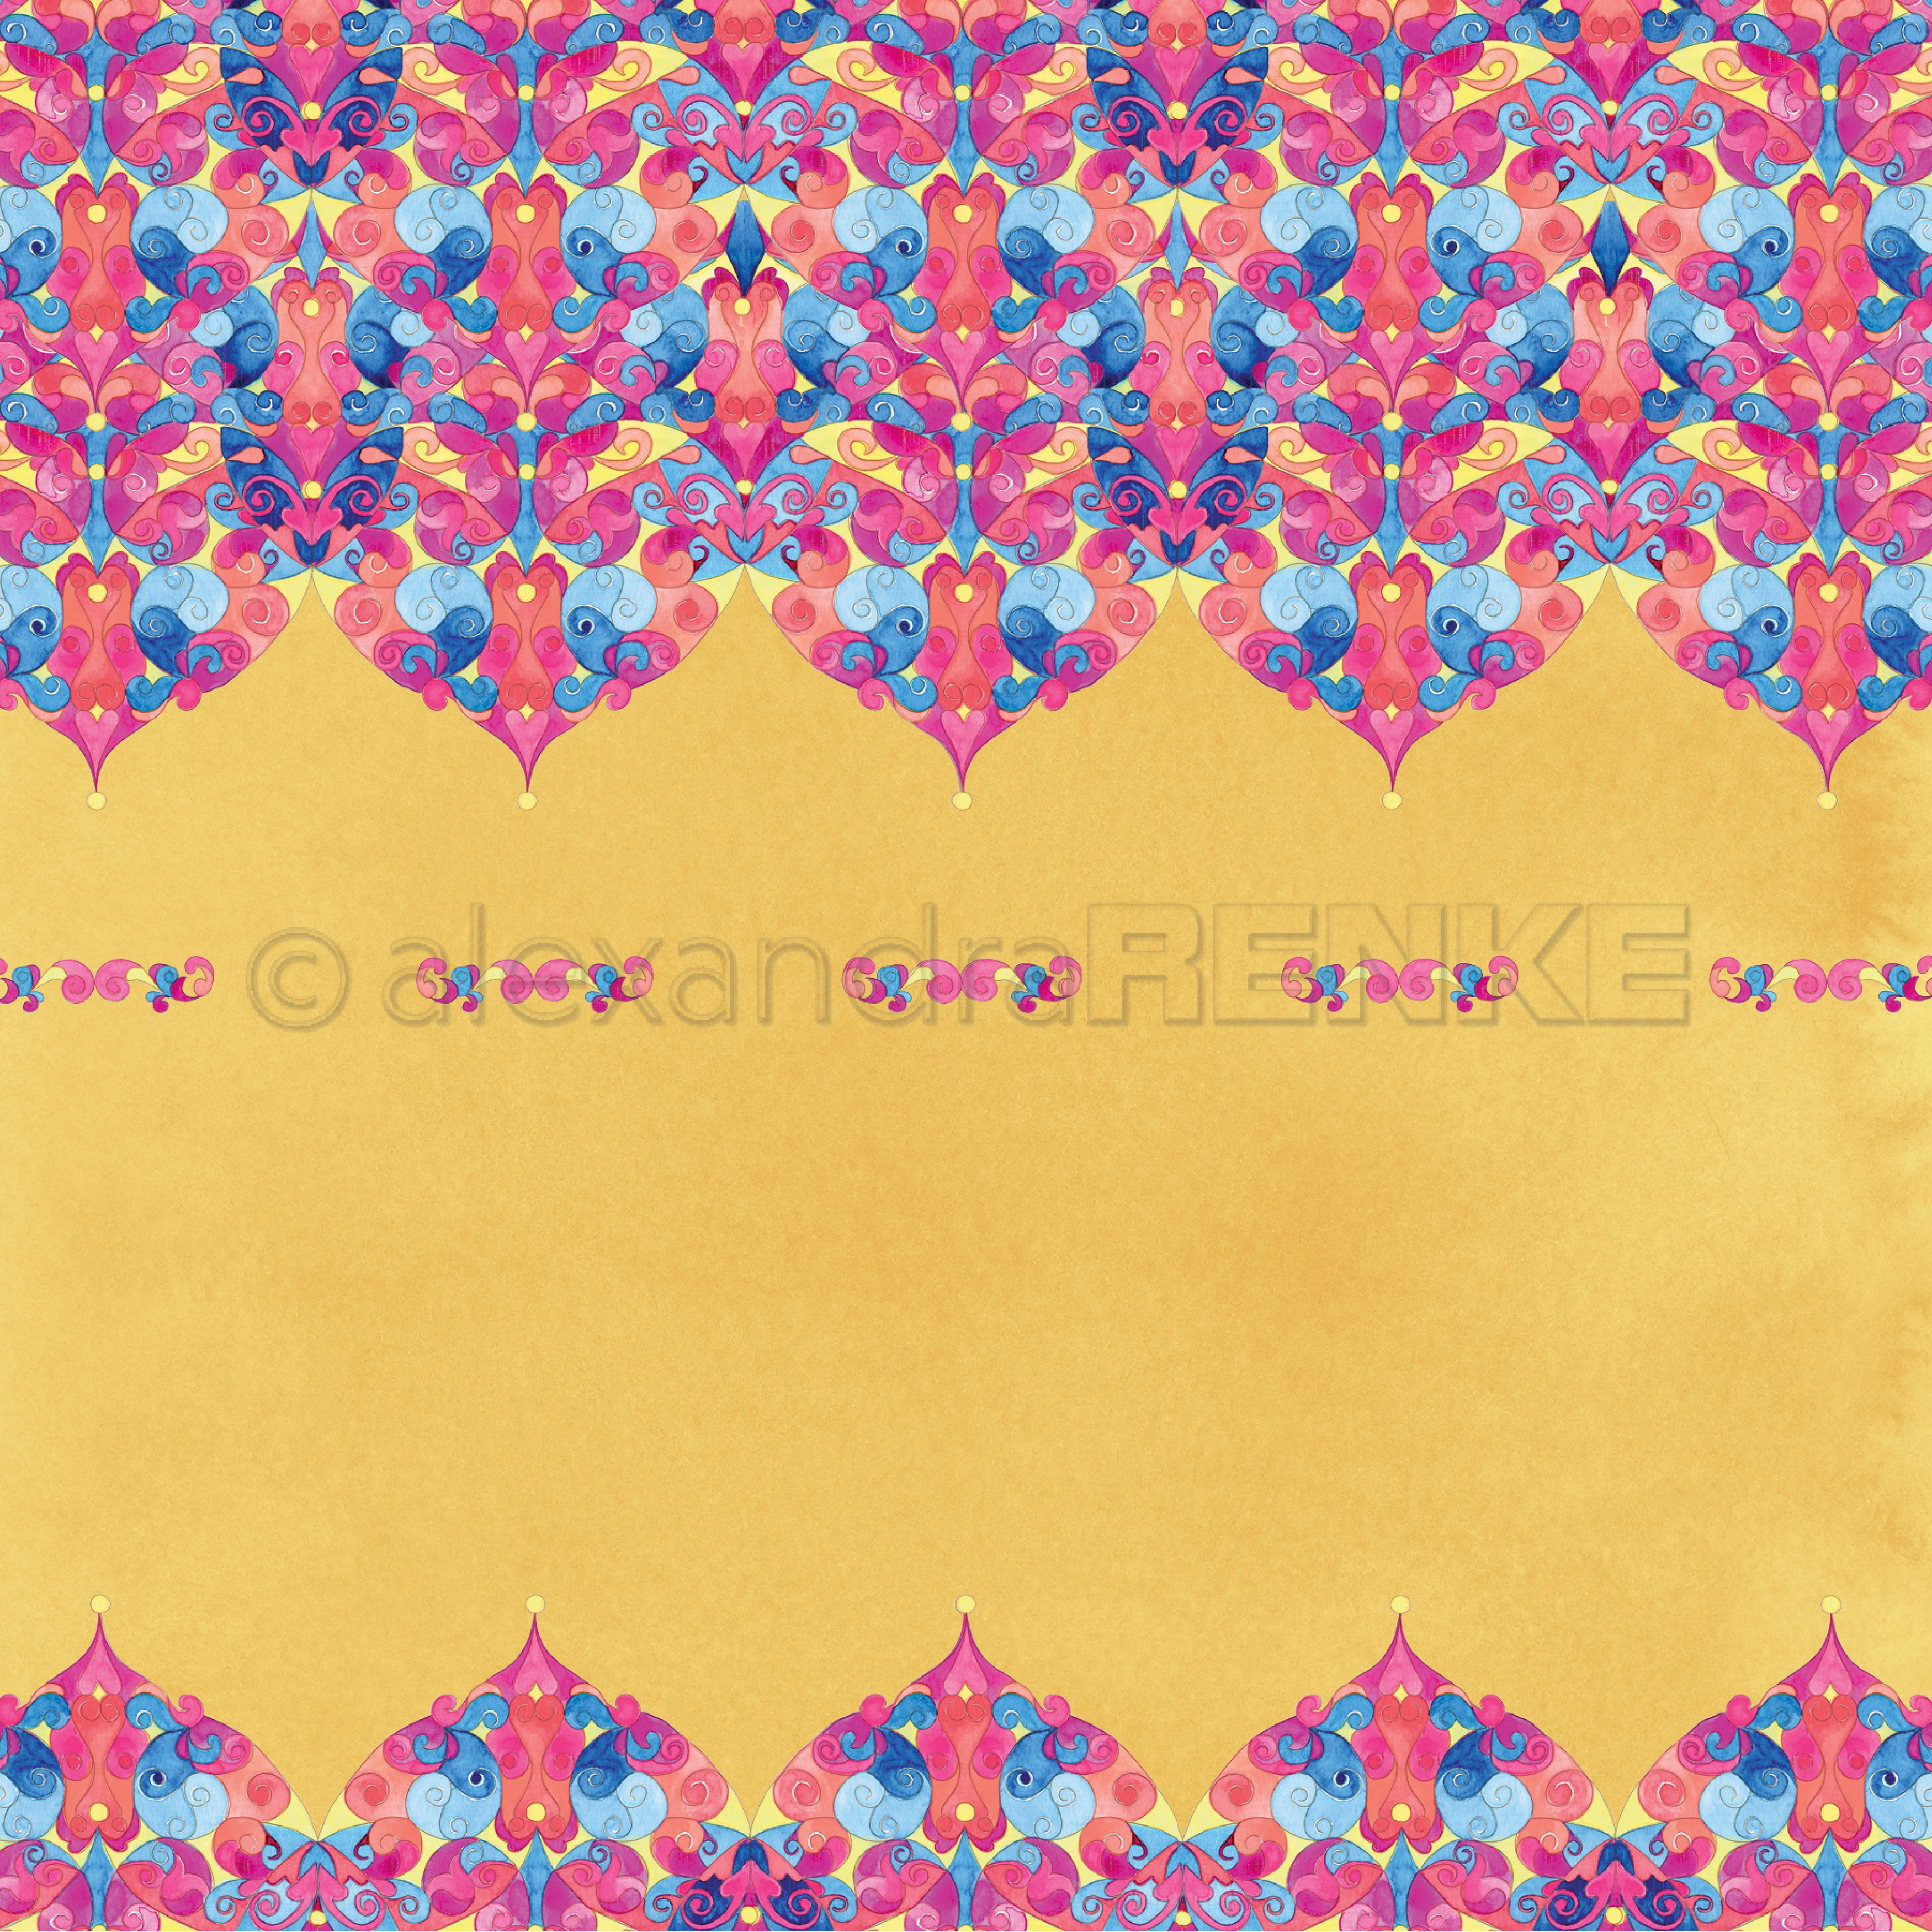 Alexandra Renke Ornamentic 2 Design Paper 12X12-Baldachin Ornament On Safran Y...